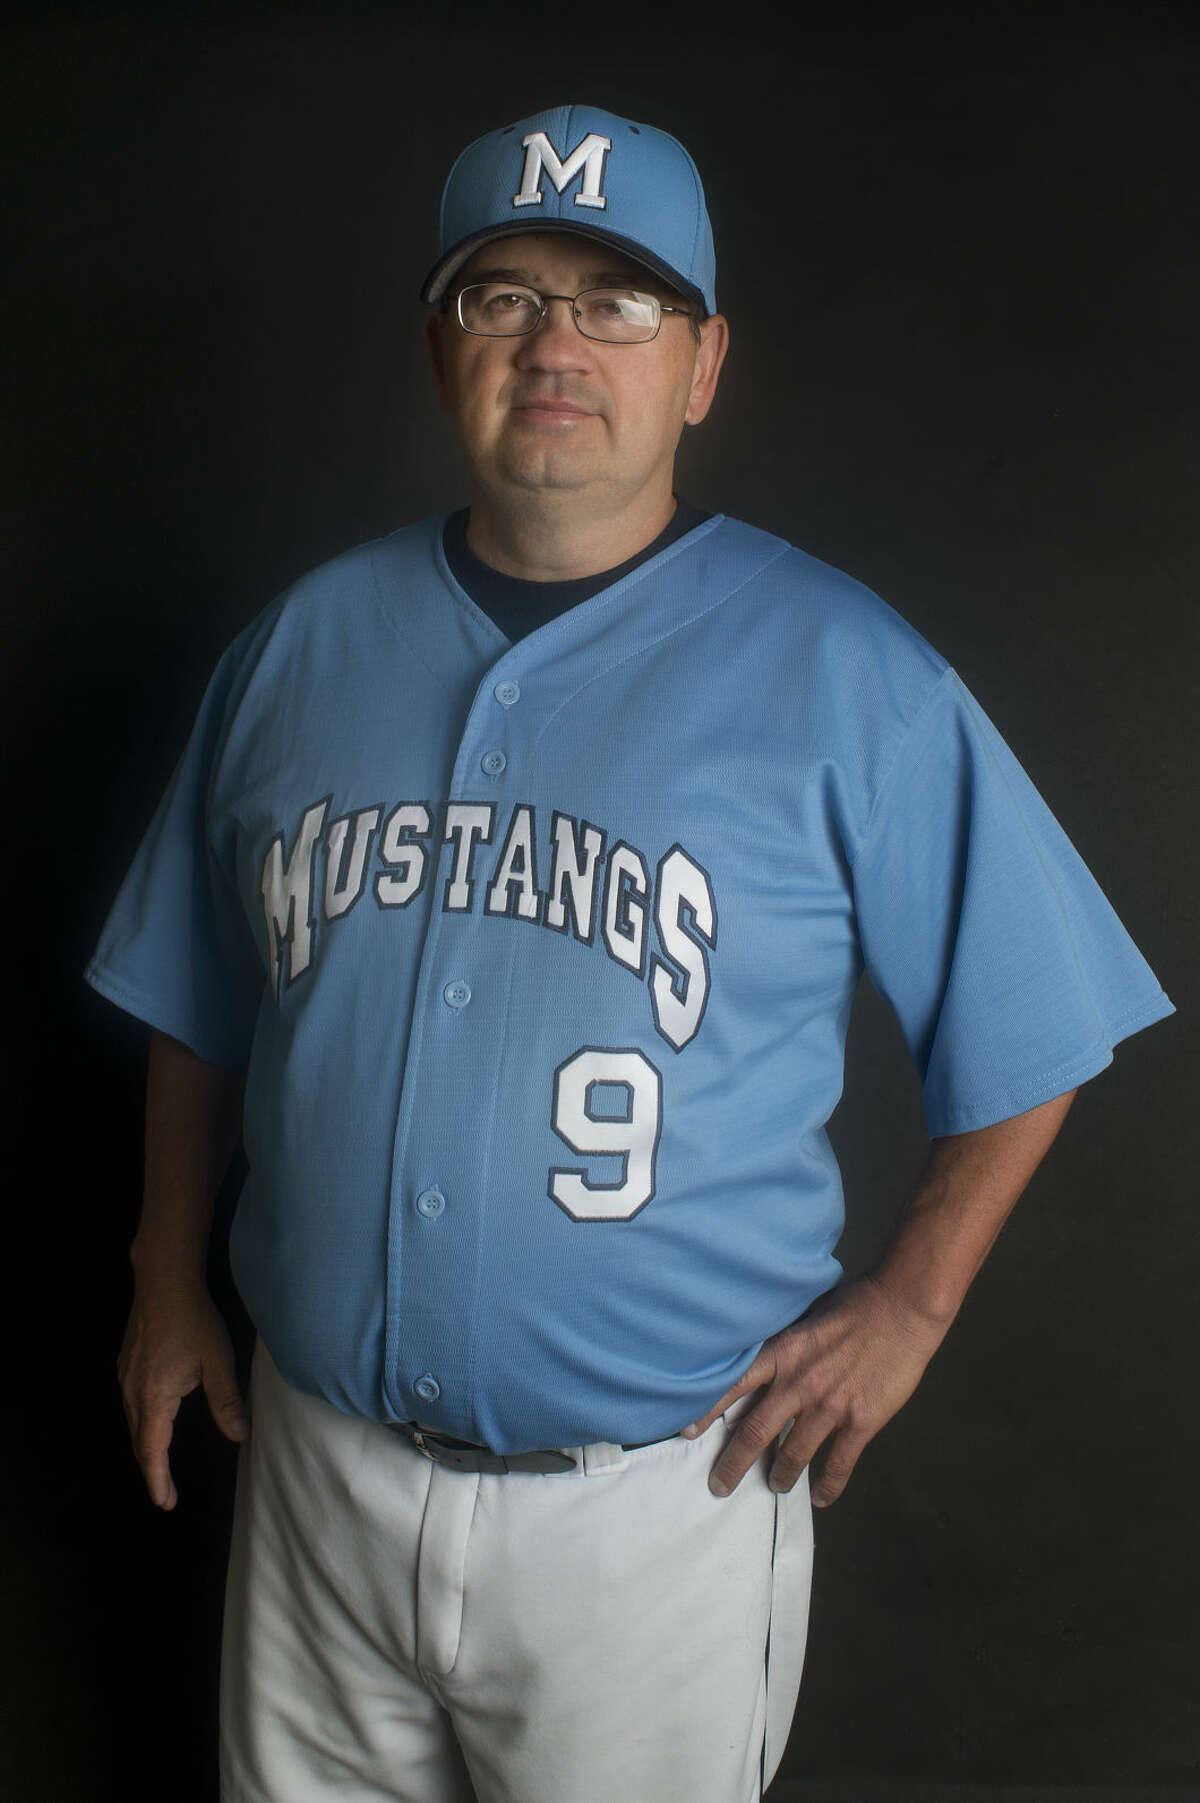 Meridian baseball coach Mark Novak hopes to continue leading Mustangs following major surgery recently.